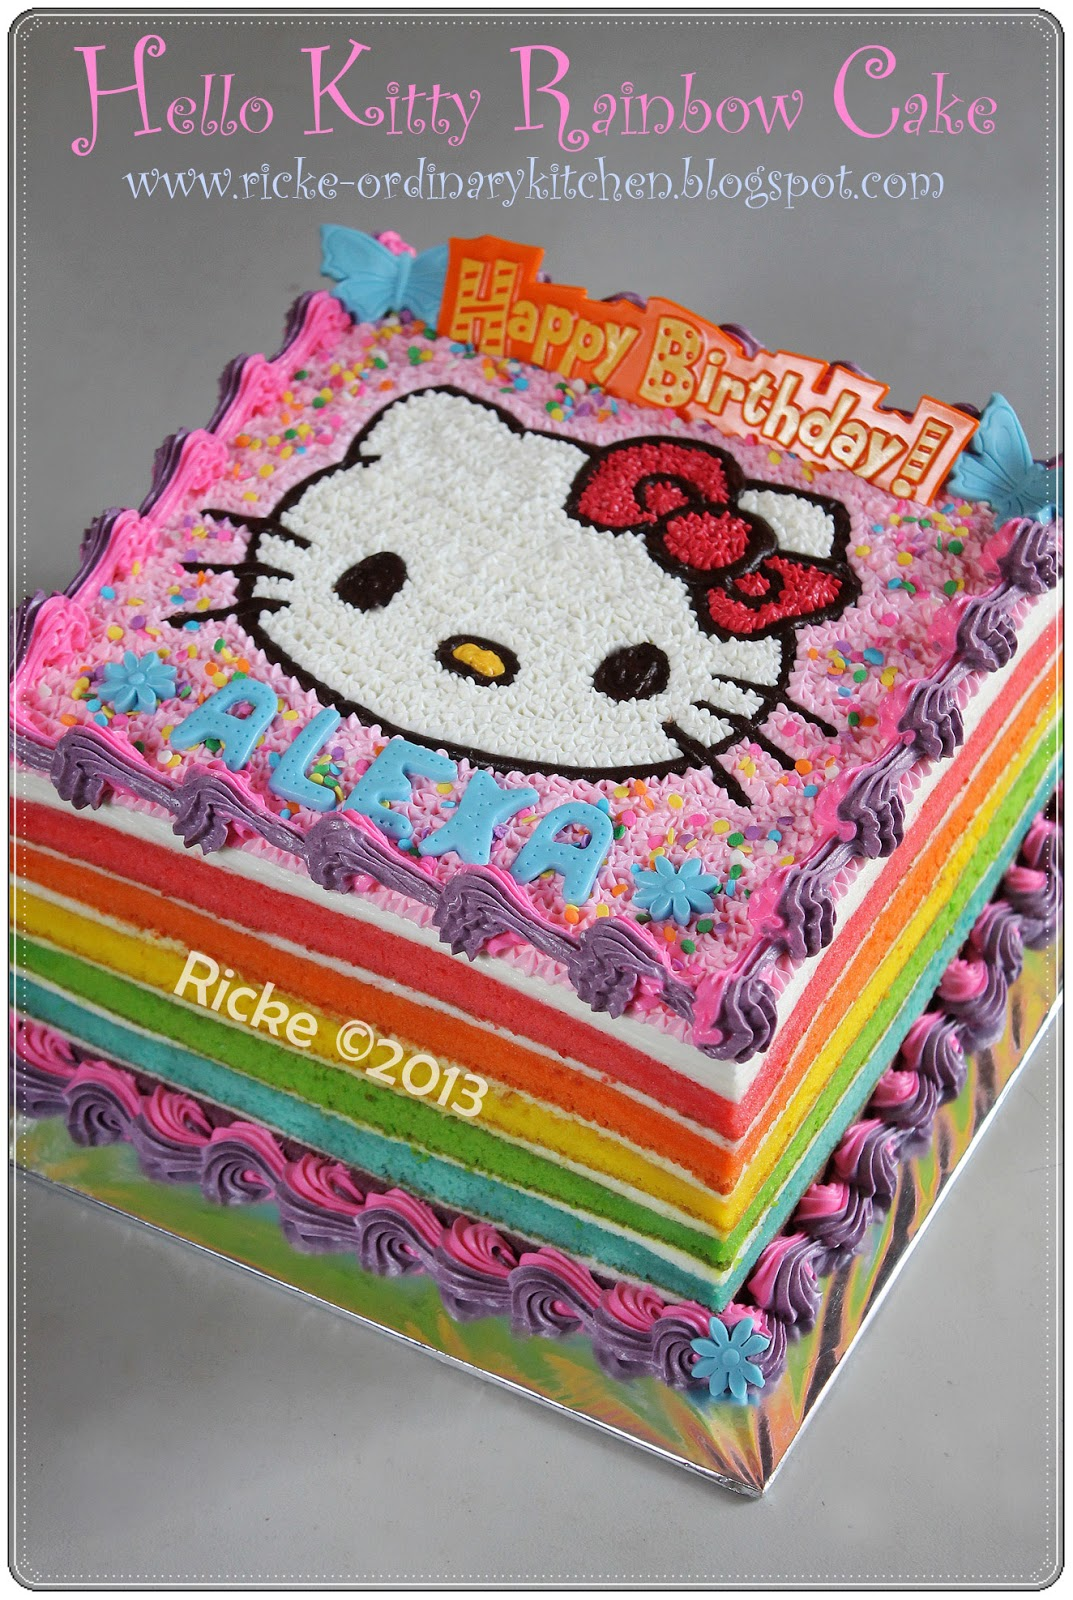 40+ Gambar Hello Kitty Di Kue, Info Baru!